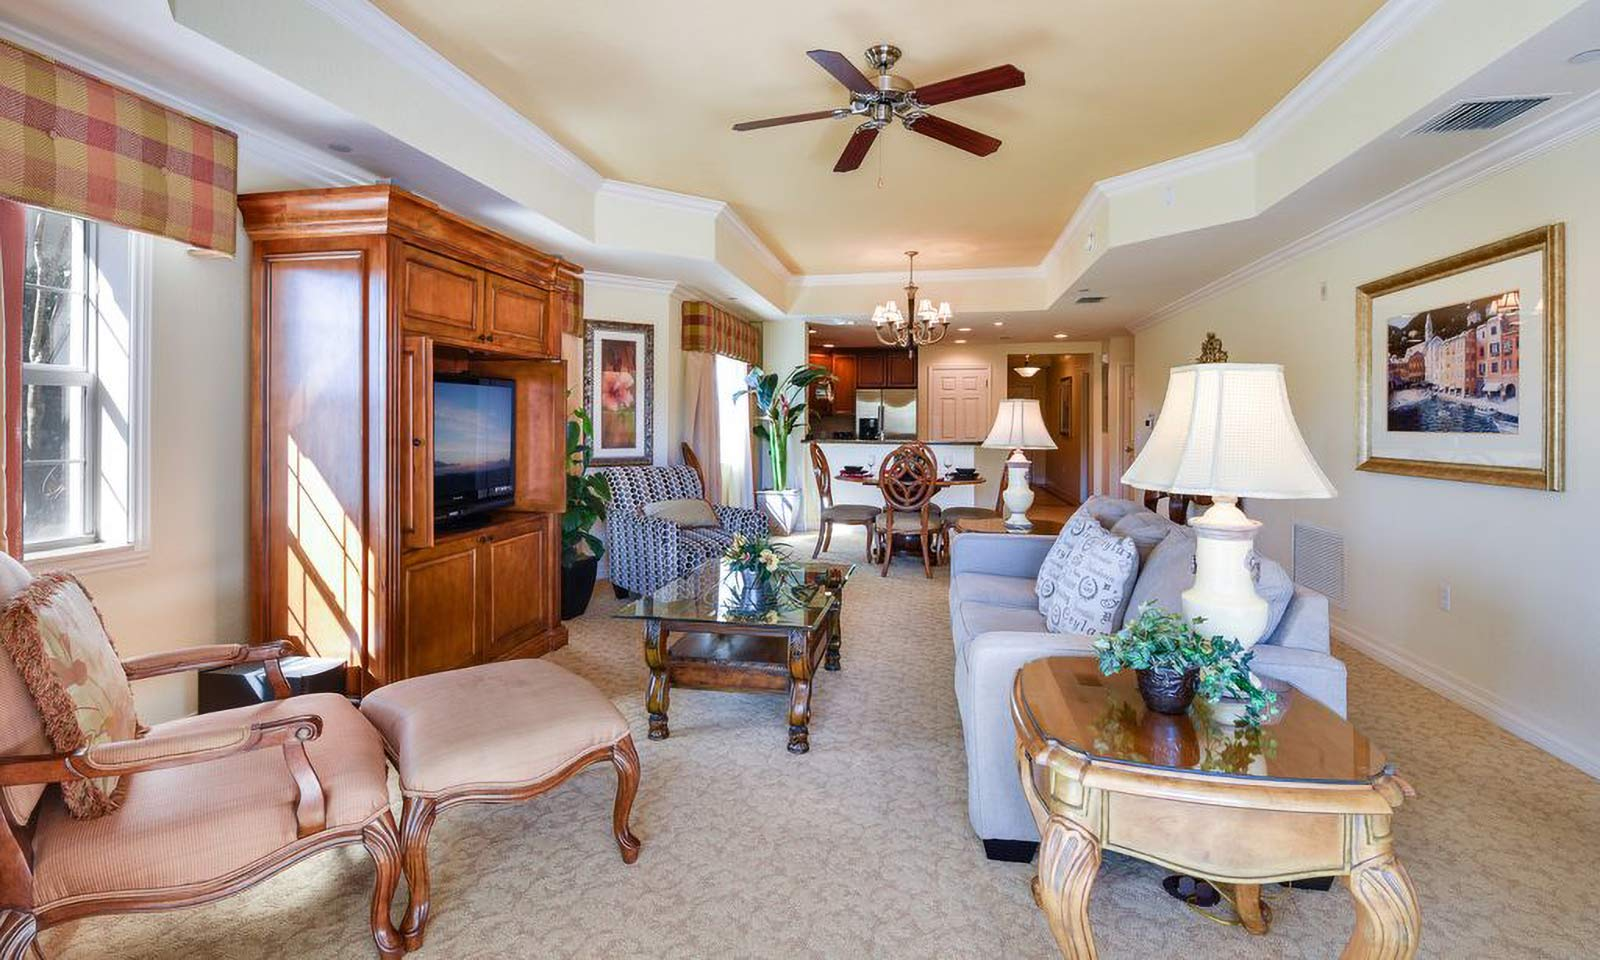 [amenities:Living-Room:3] Living Room